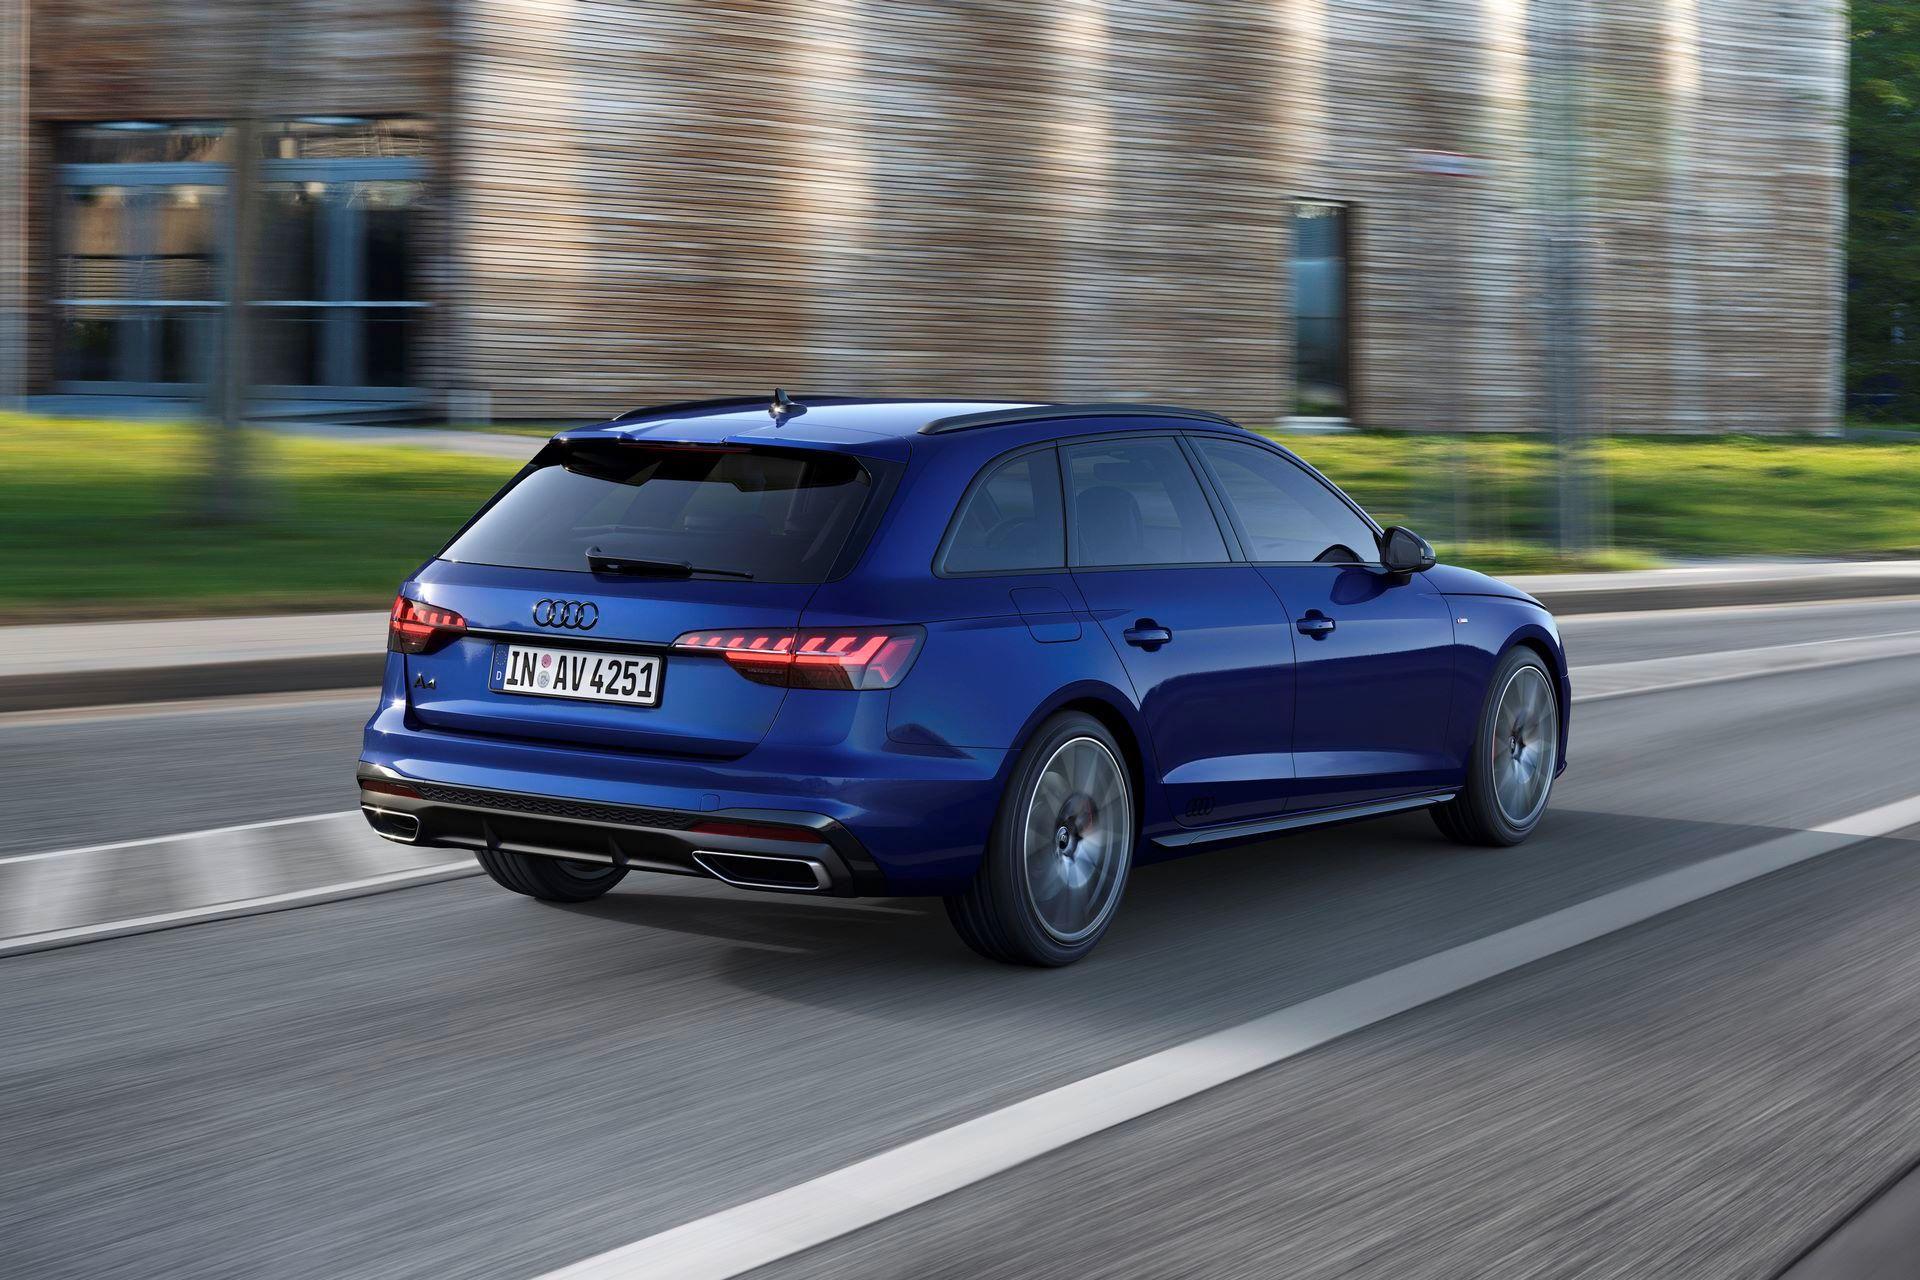 Audi-A4-A5-Q7-Q8-Competition-And-Competition-Plus-Trims-59